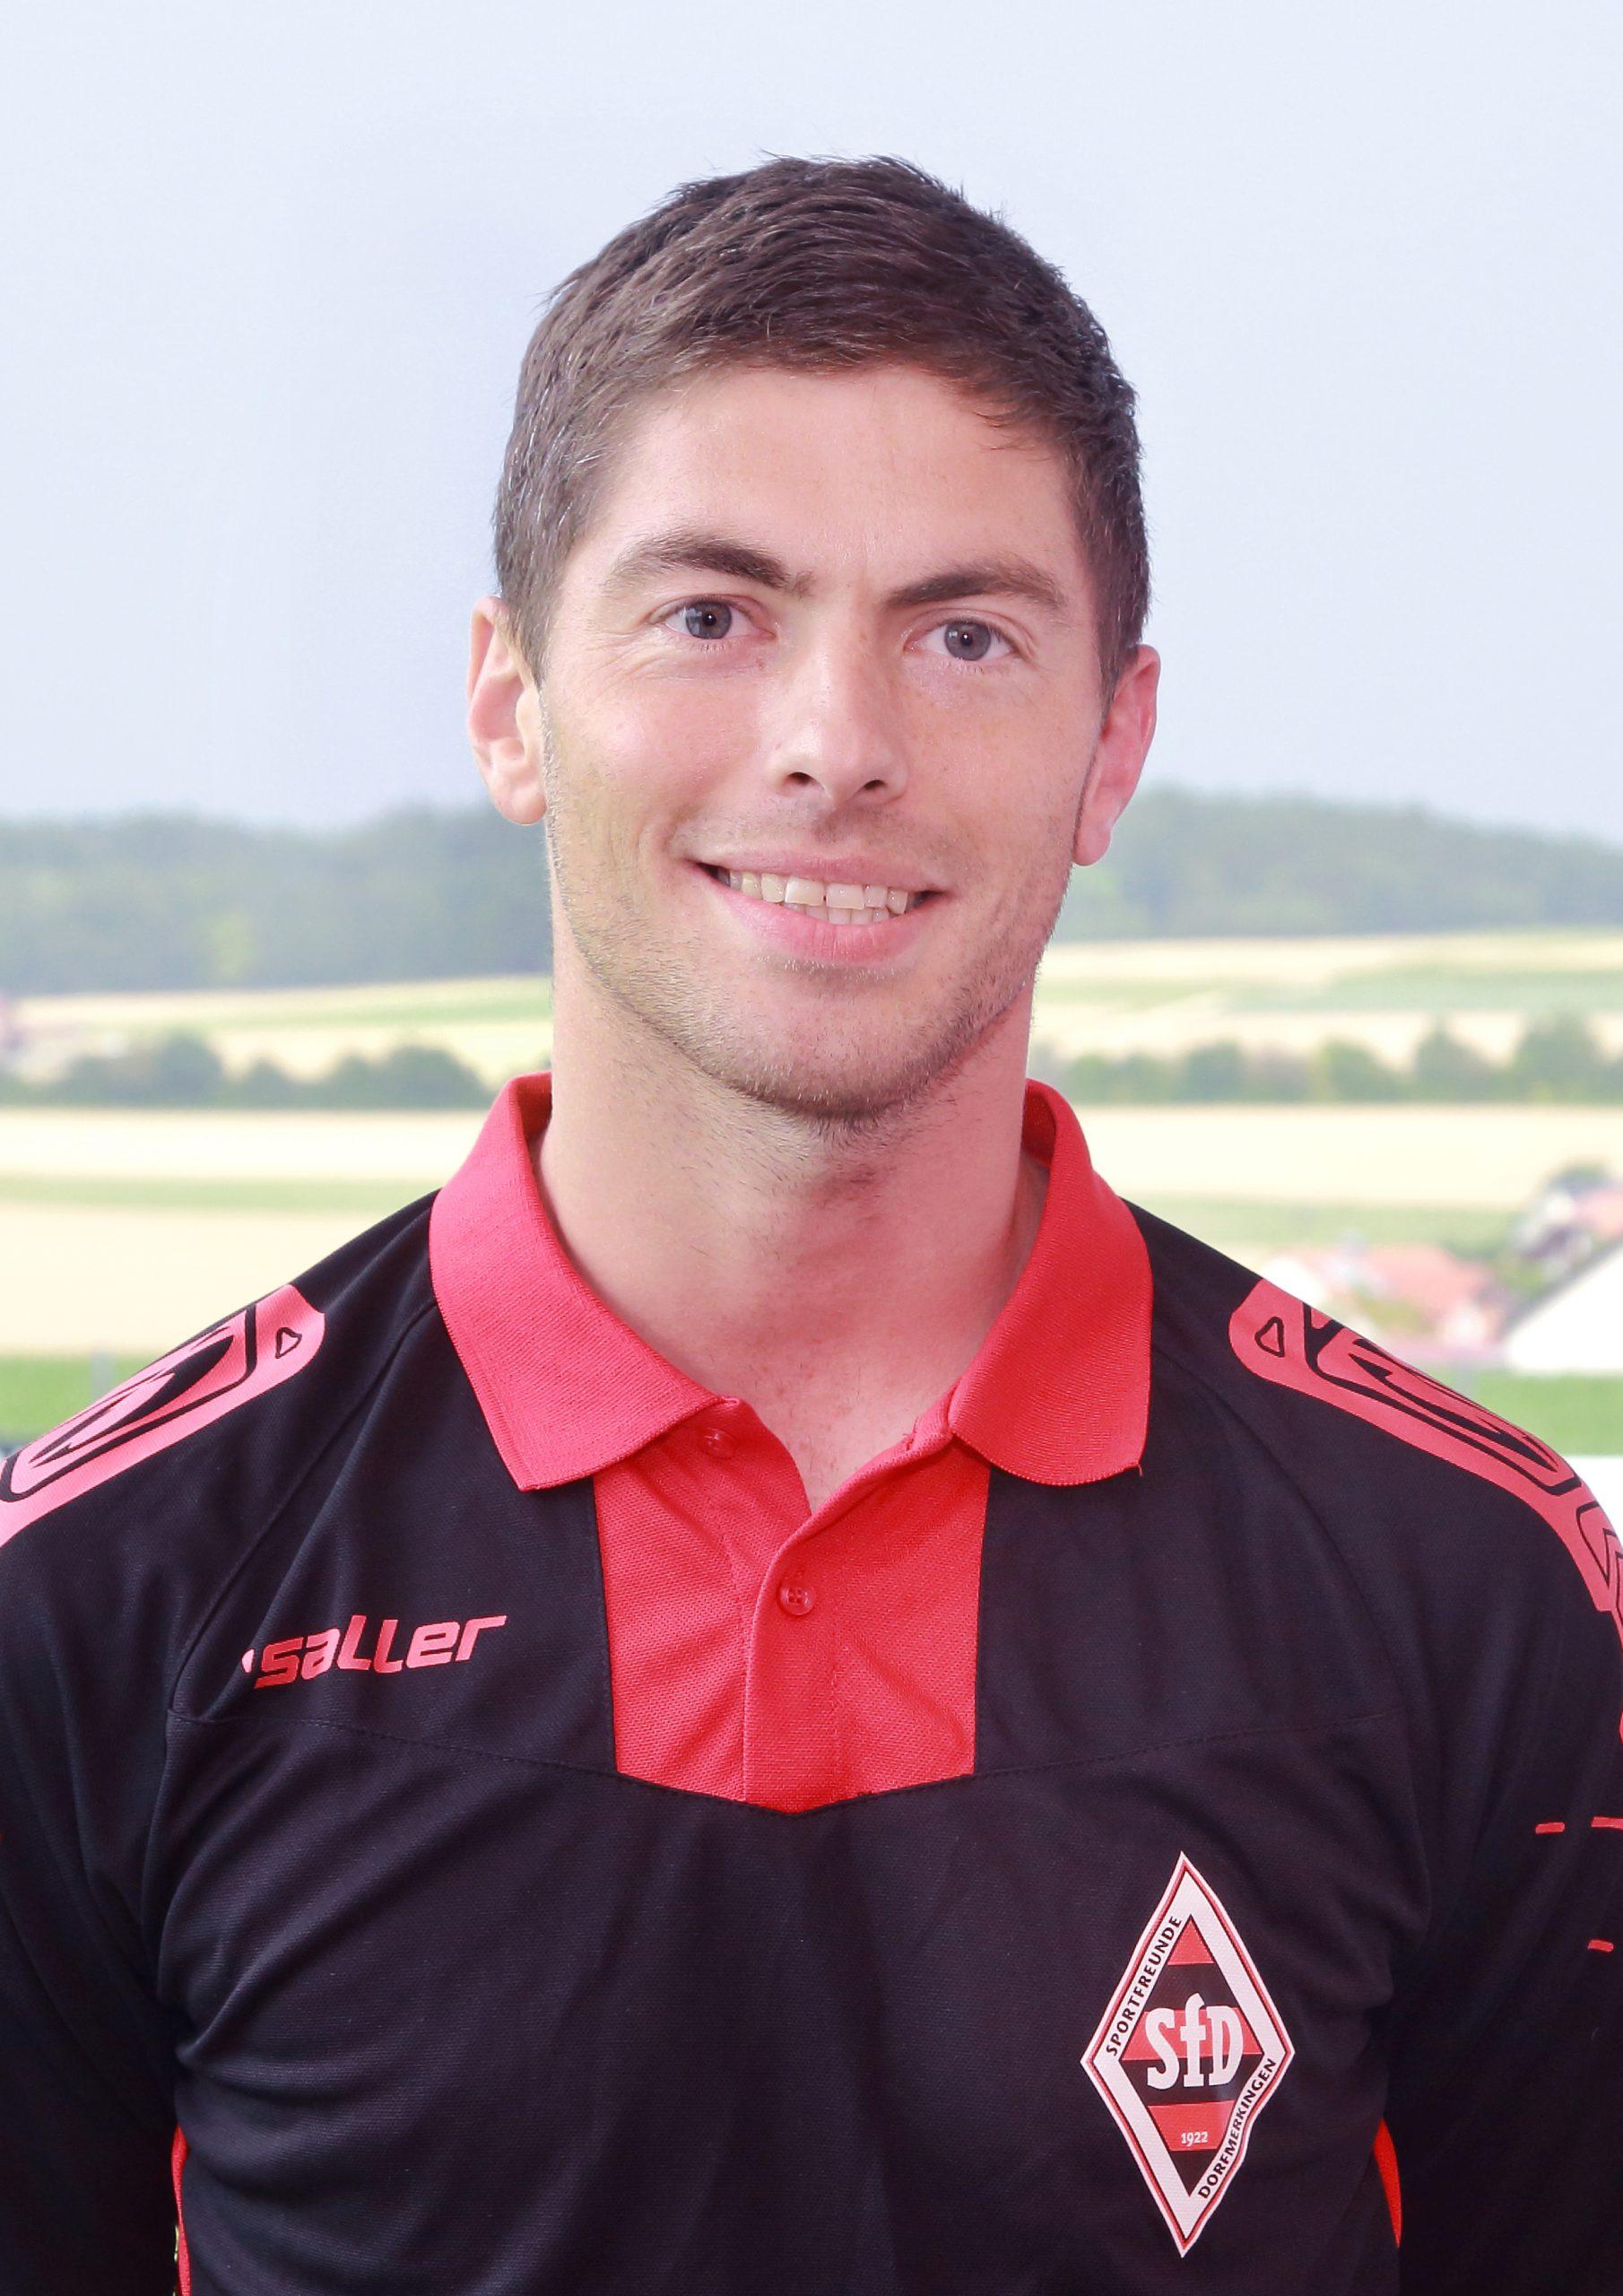 Nicolai Sauer